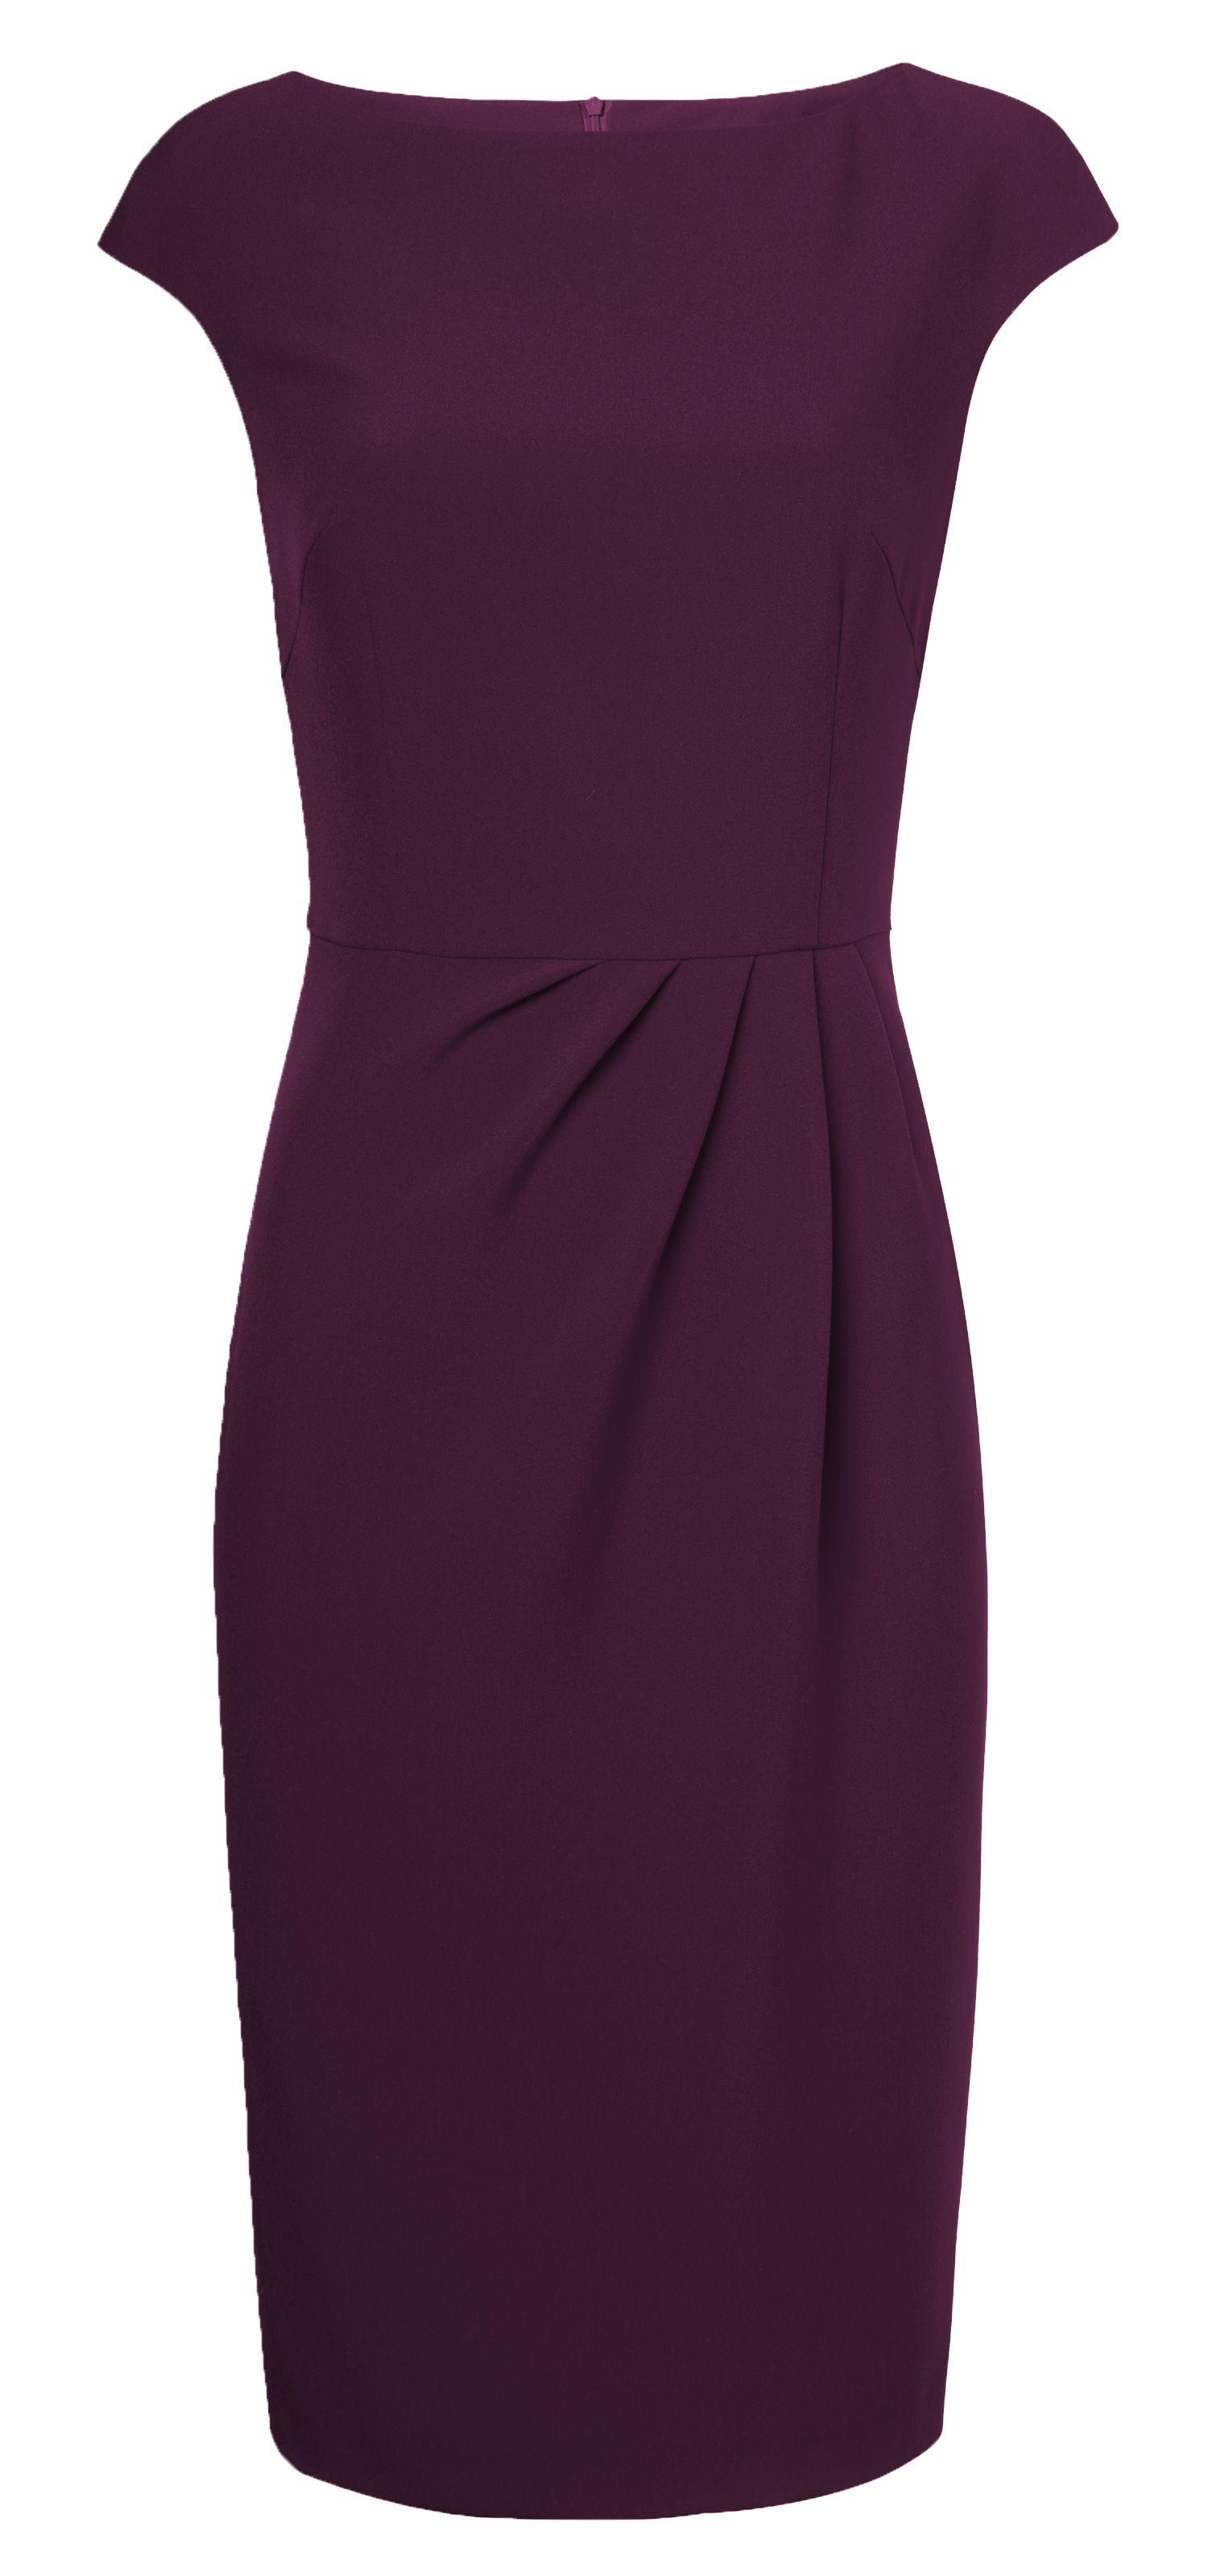 Tailored Dress 47